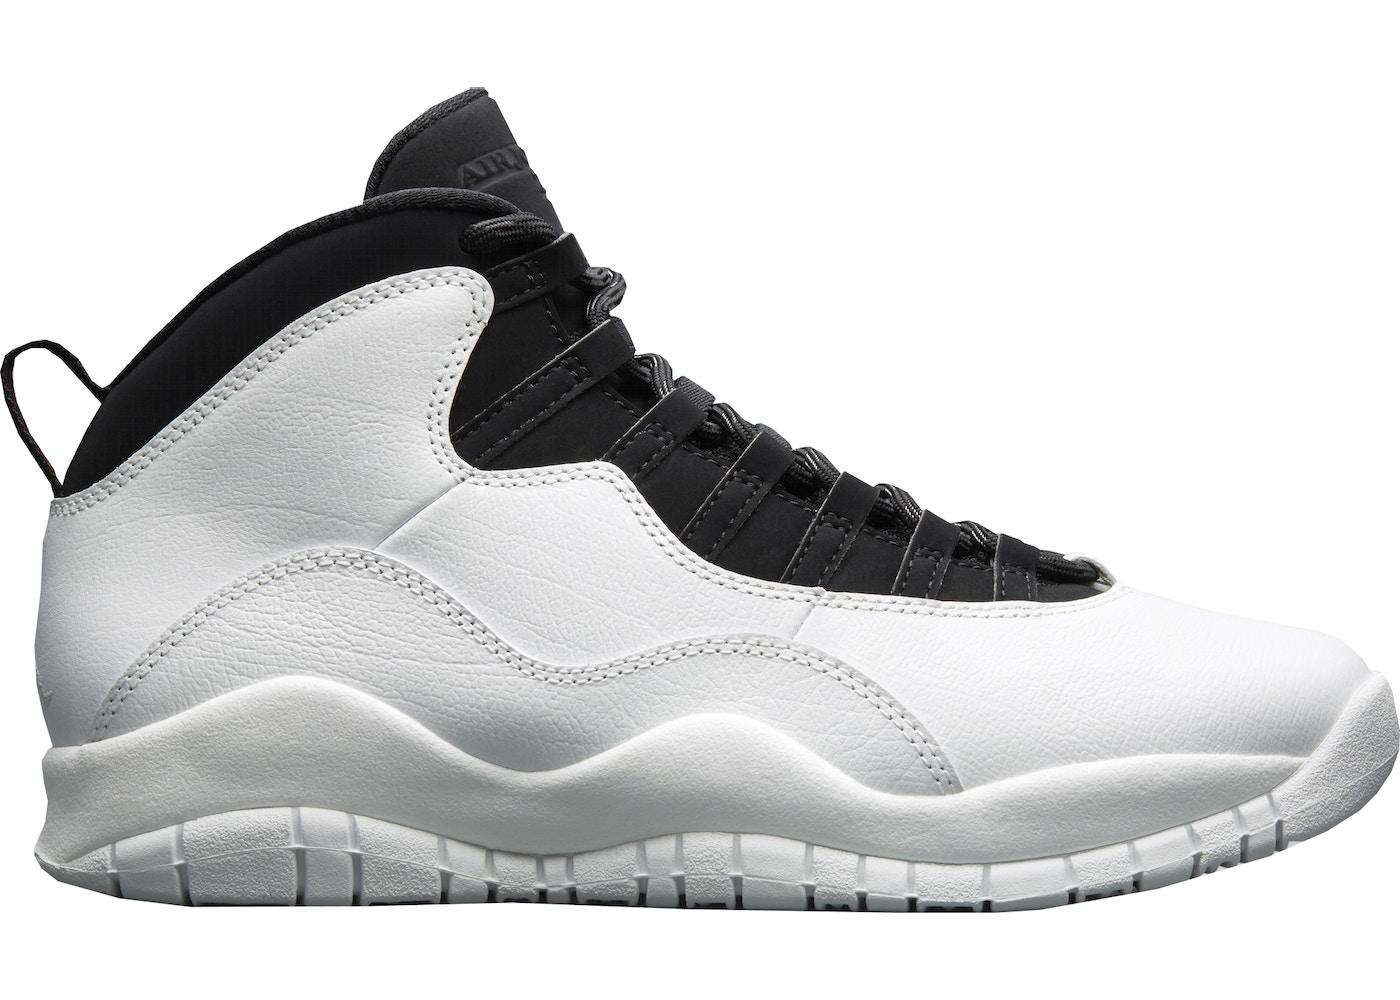 online store bde4f 28d97 Buy Air Jordan 10 Shoes & Deadstock Sneakers